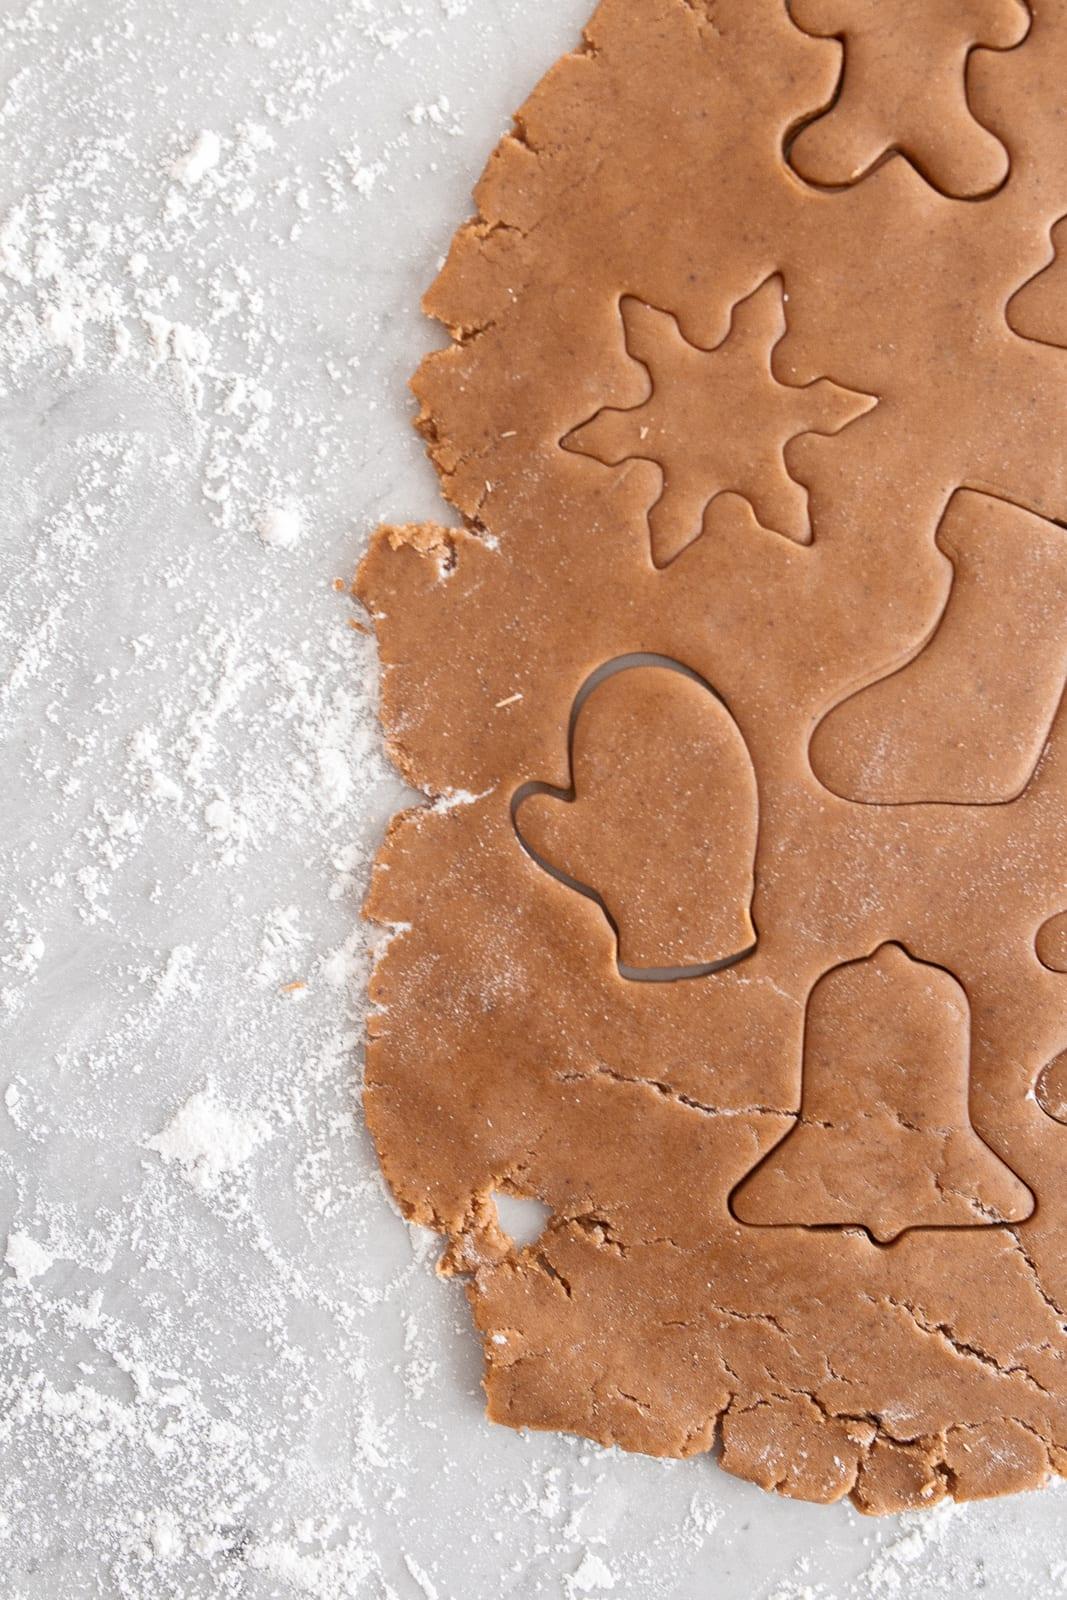 Blog Hop Cookie Swap Gingerbread Cookie Recipe Bria Hammel Interiors